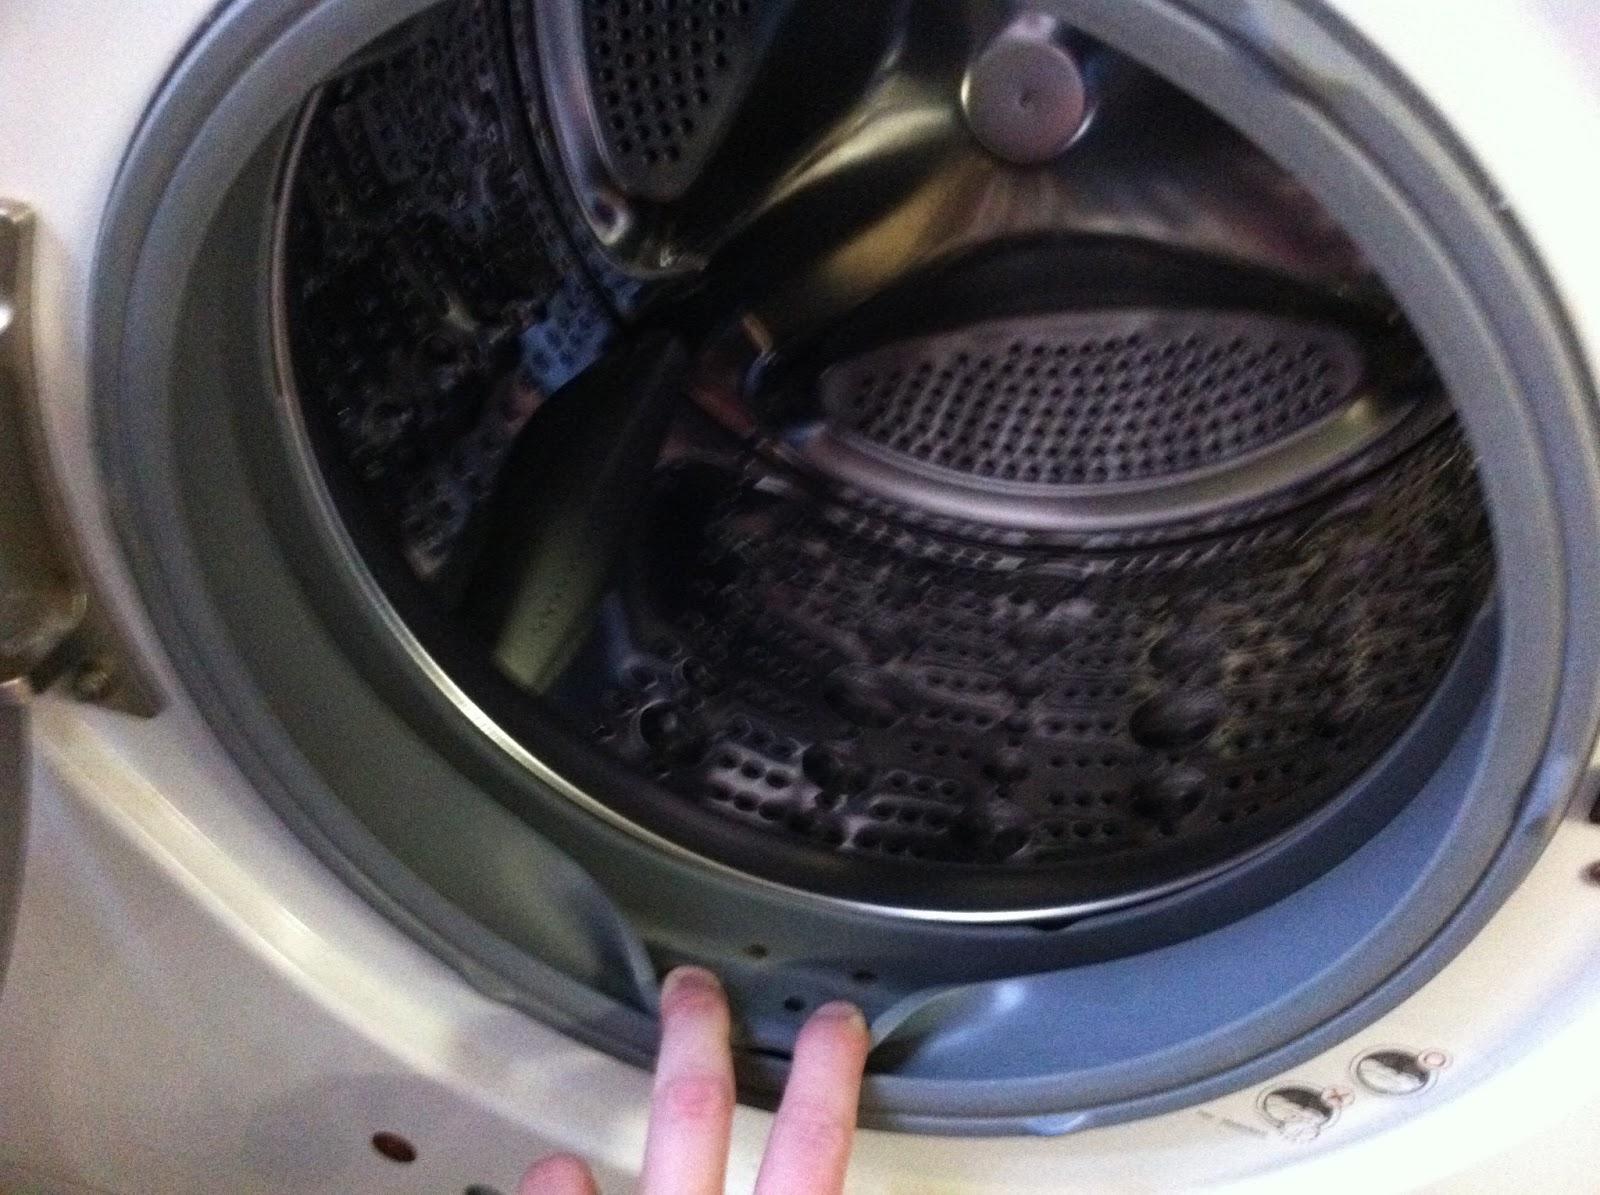 waschmaschine hinterl t dunkle flecken shot blog. Black Bedroom Furniture Sets. Home Design Ideas